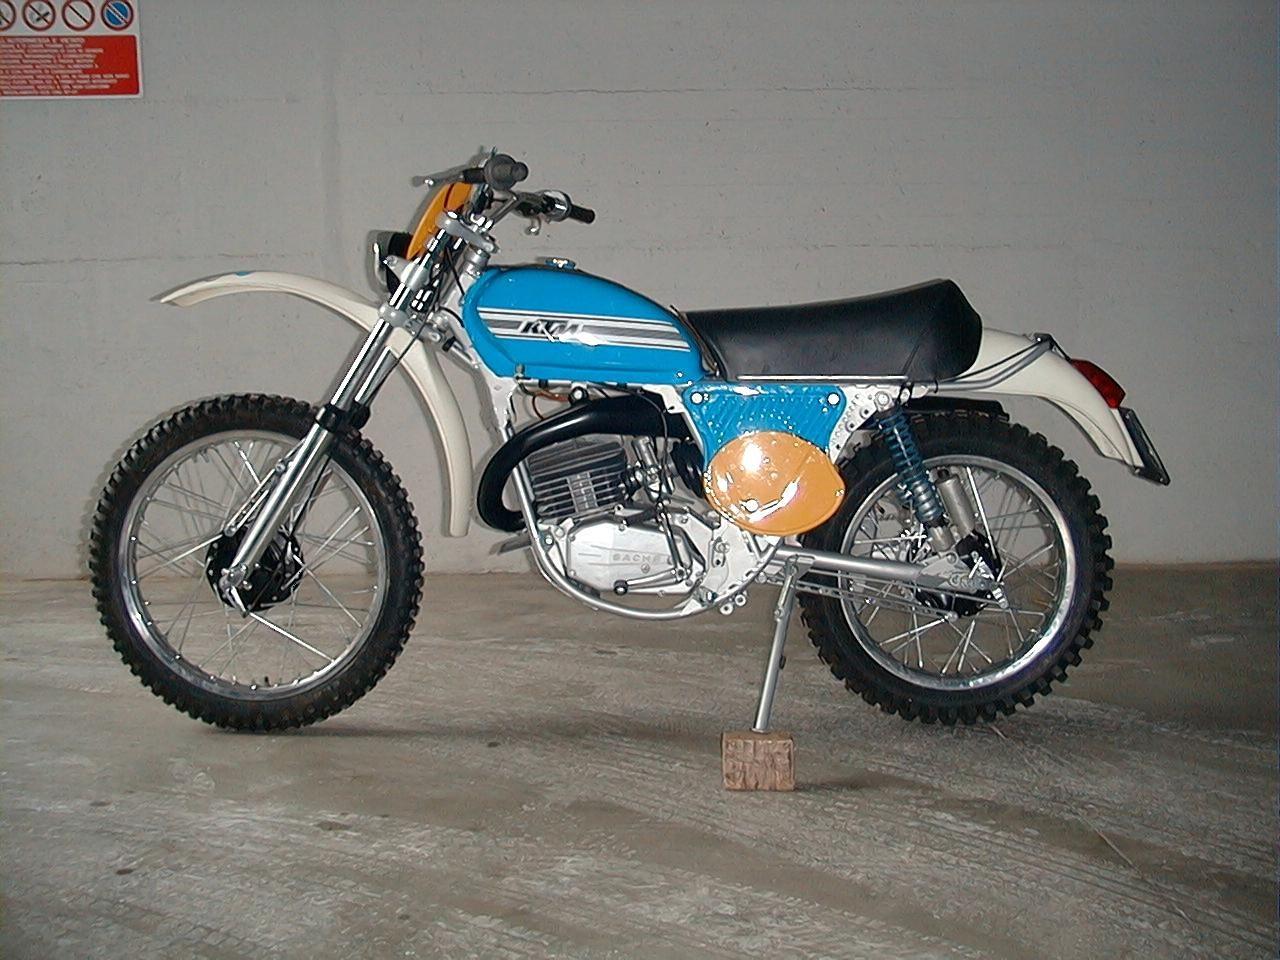 ktm 125 gs 1975 vintage bikes riders enduro motorcycle. Black Bedroom Furniture Sets. Home Design Ideas